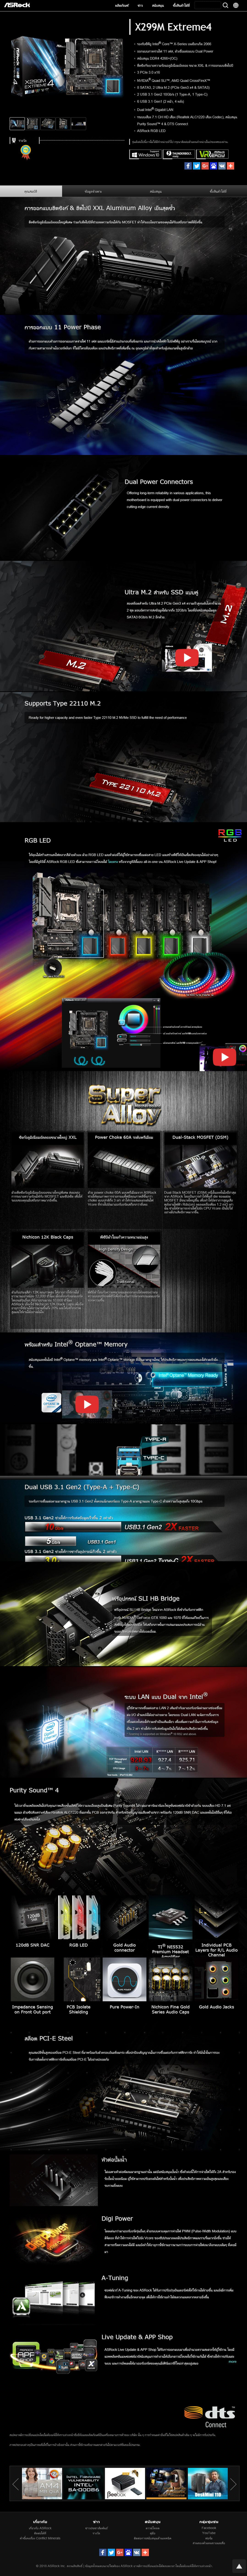 2018 04 02 18 25 19 ASROCK X299M Extreme4 LGA 2066 Review